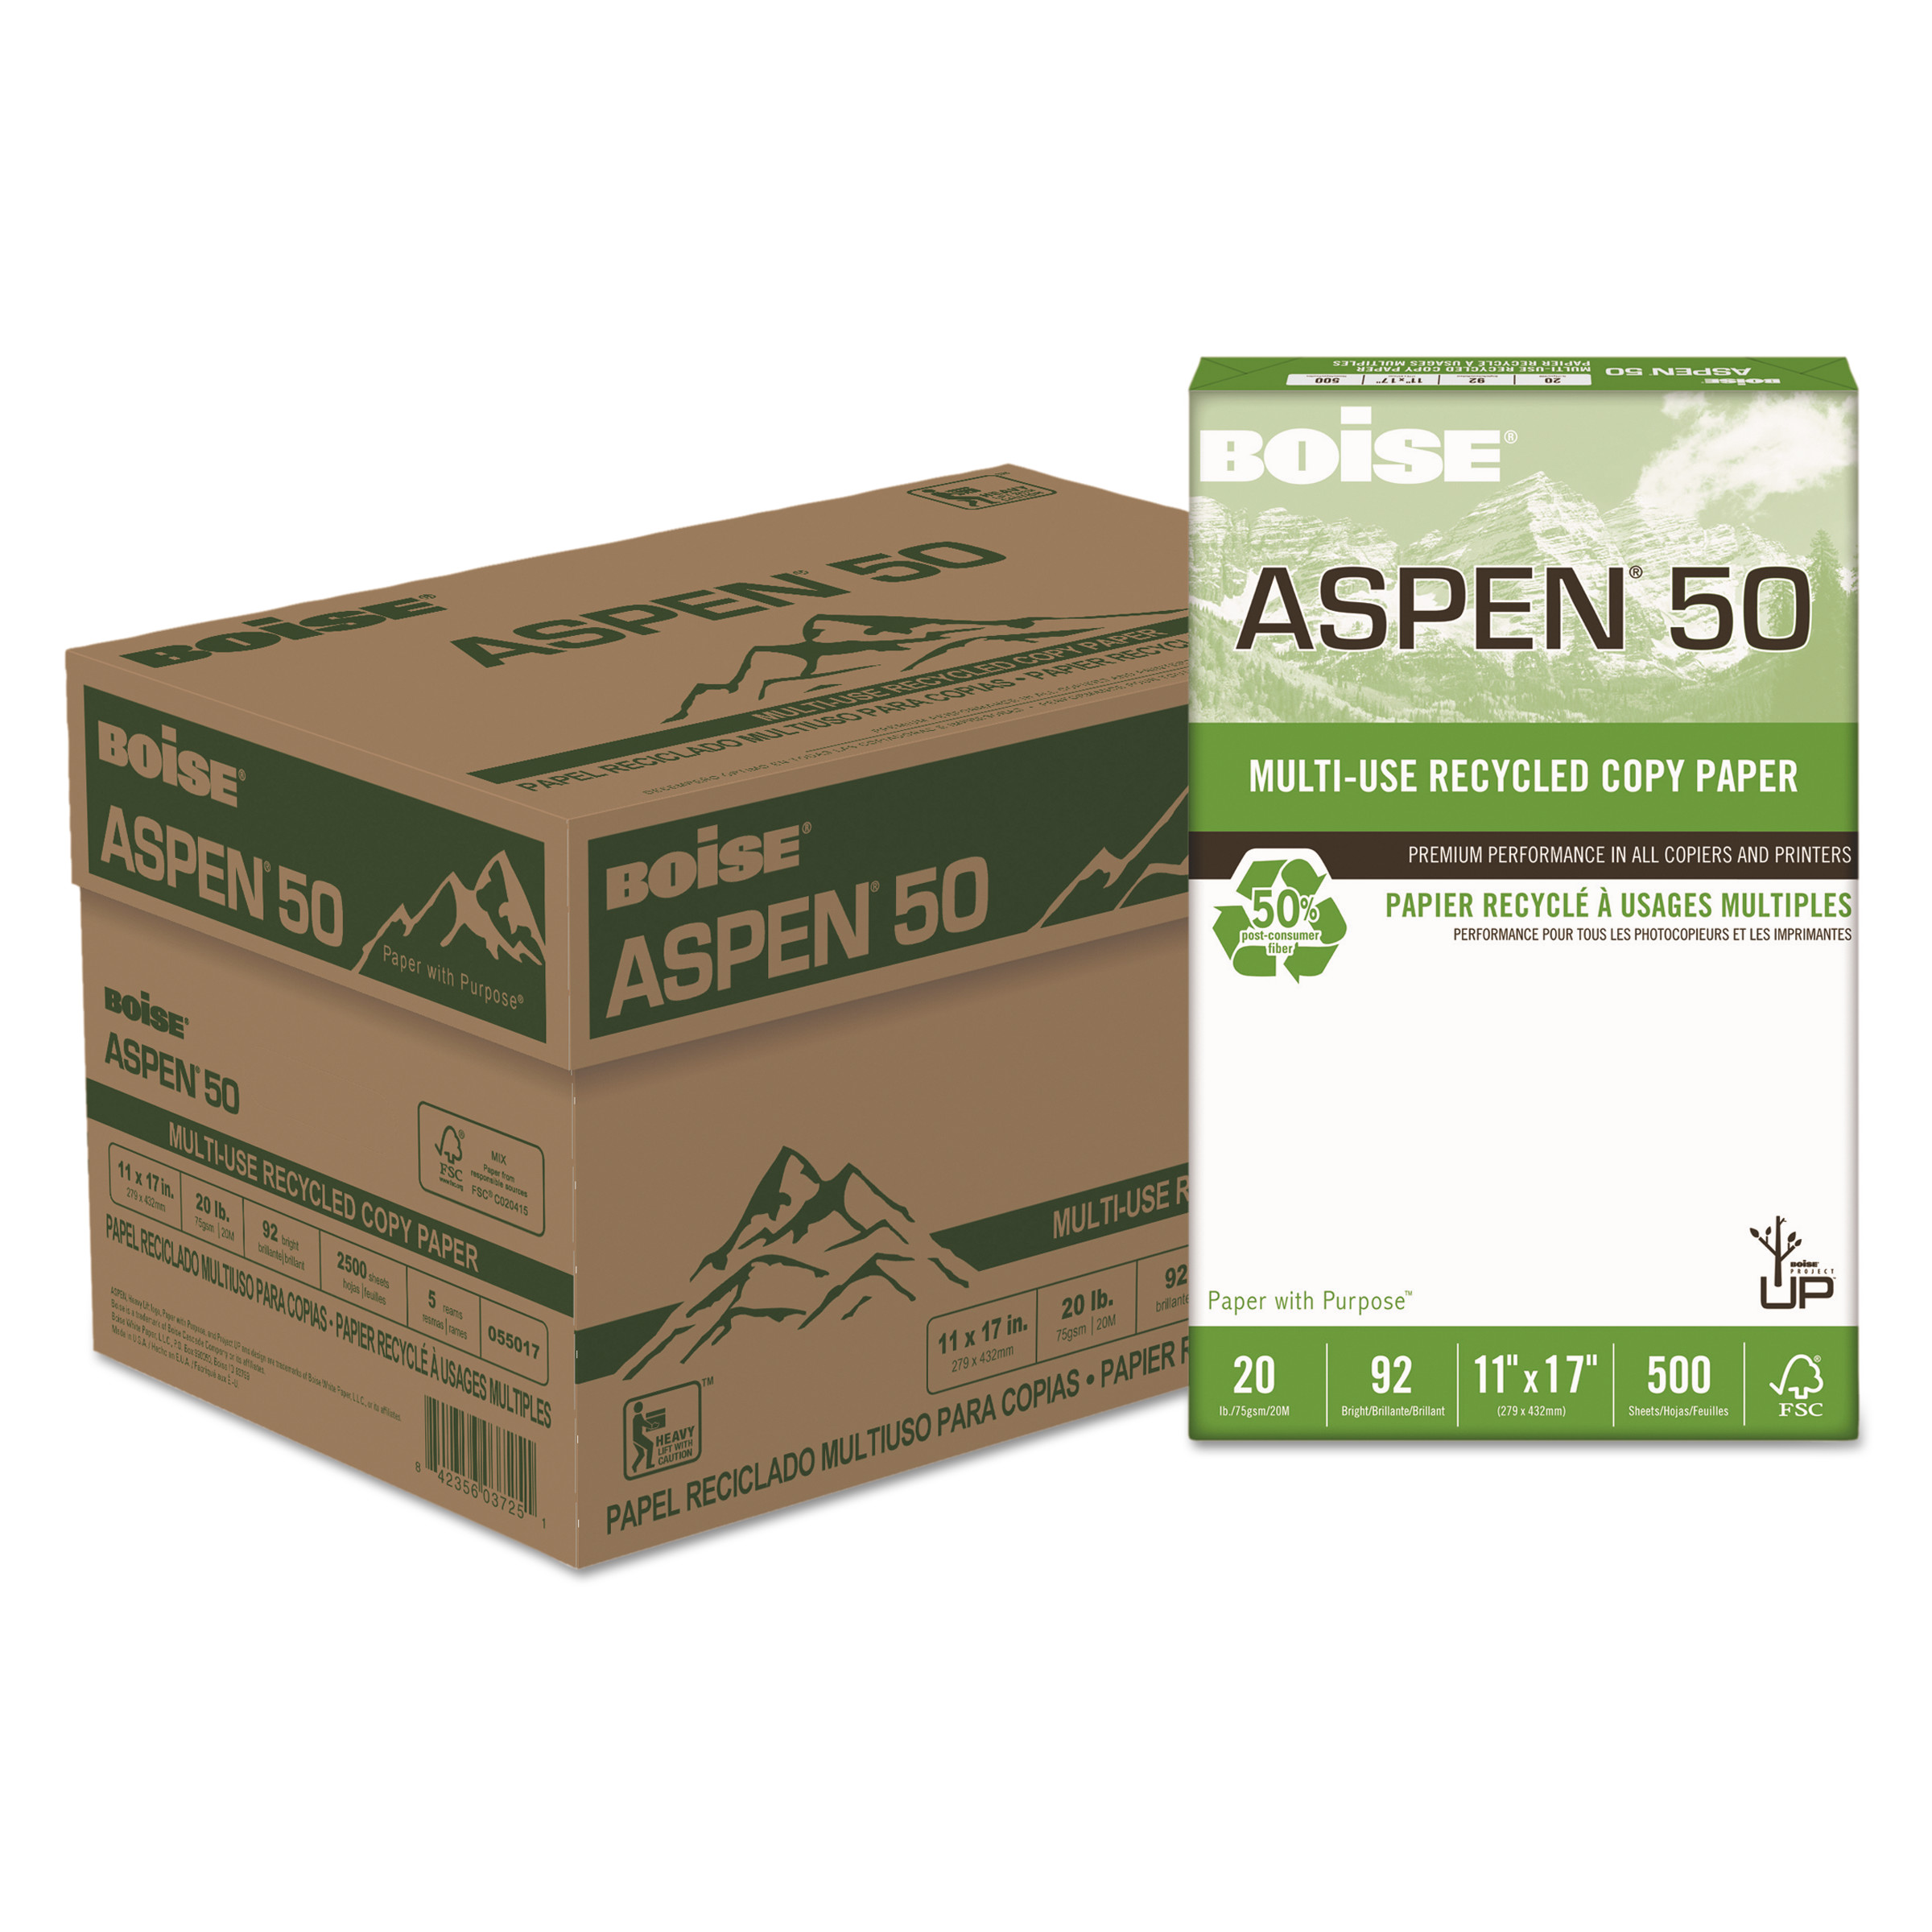 Boise ASPEN 50% Multi-Use Recycled Paper, 20 lb, 11 x 17, White, 5 Reams/Carton